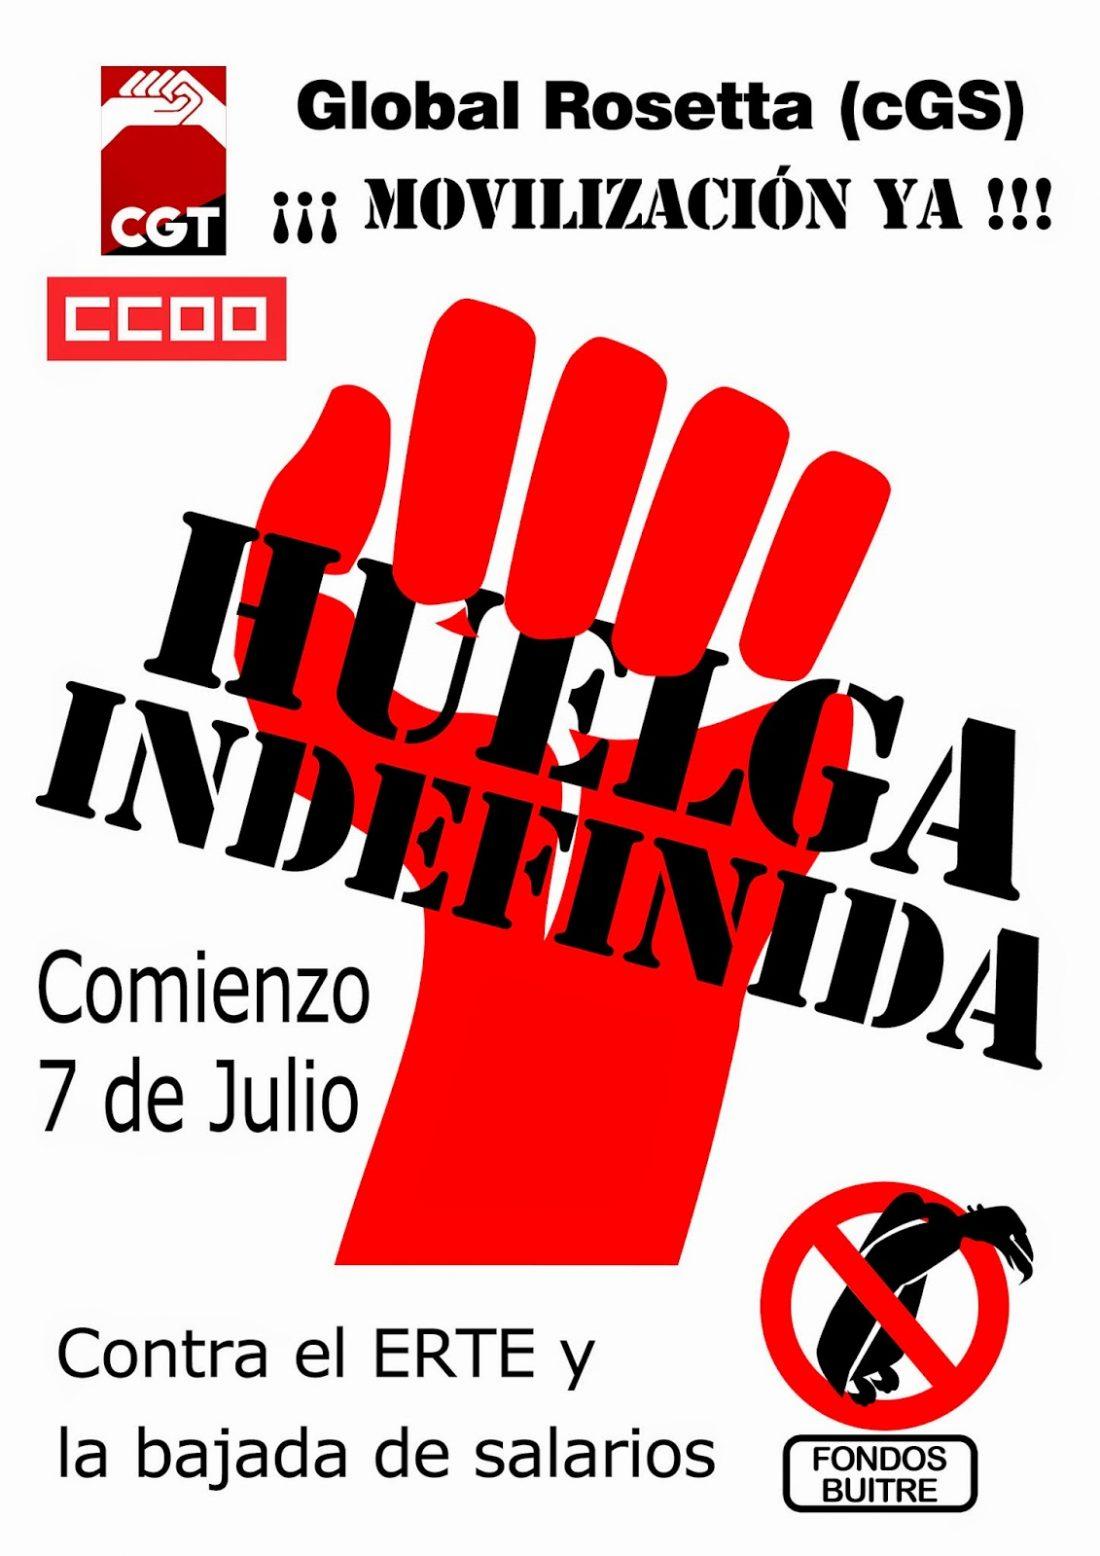 Comienza la huelga indefinida en Global Rosetta